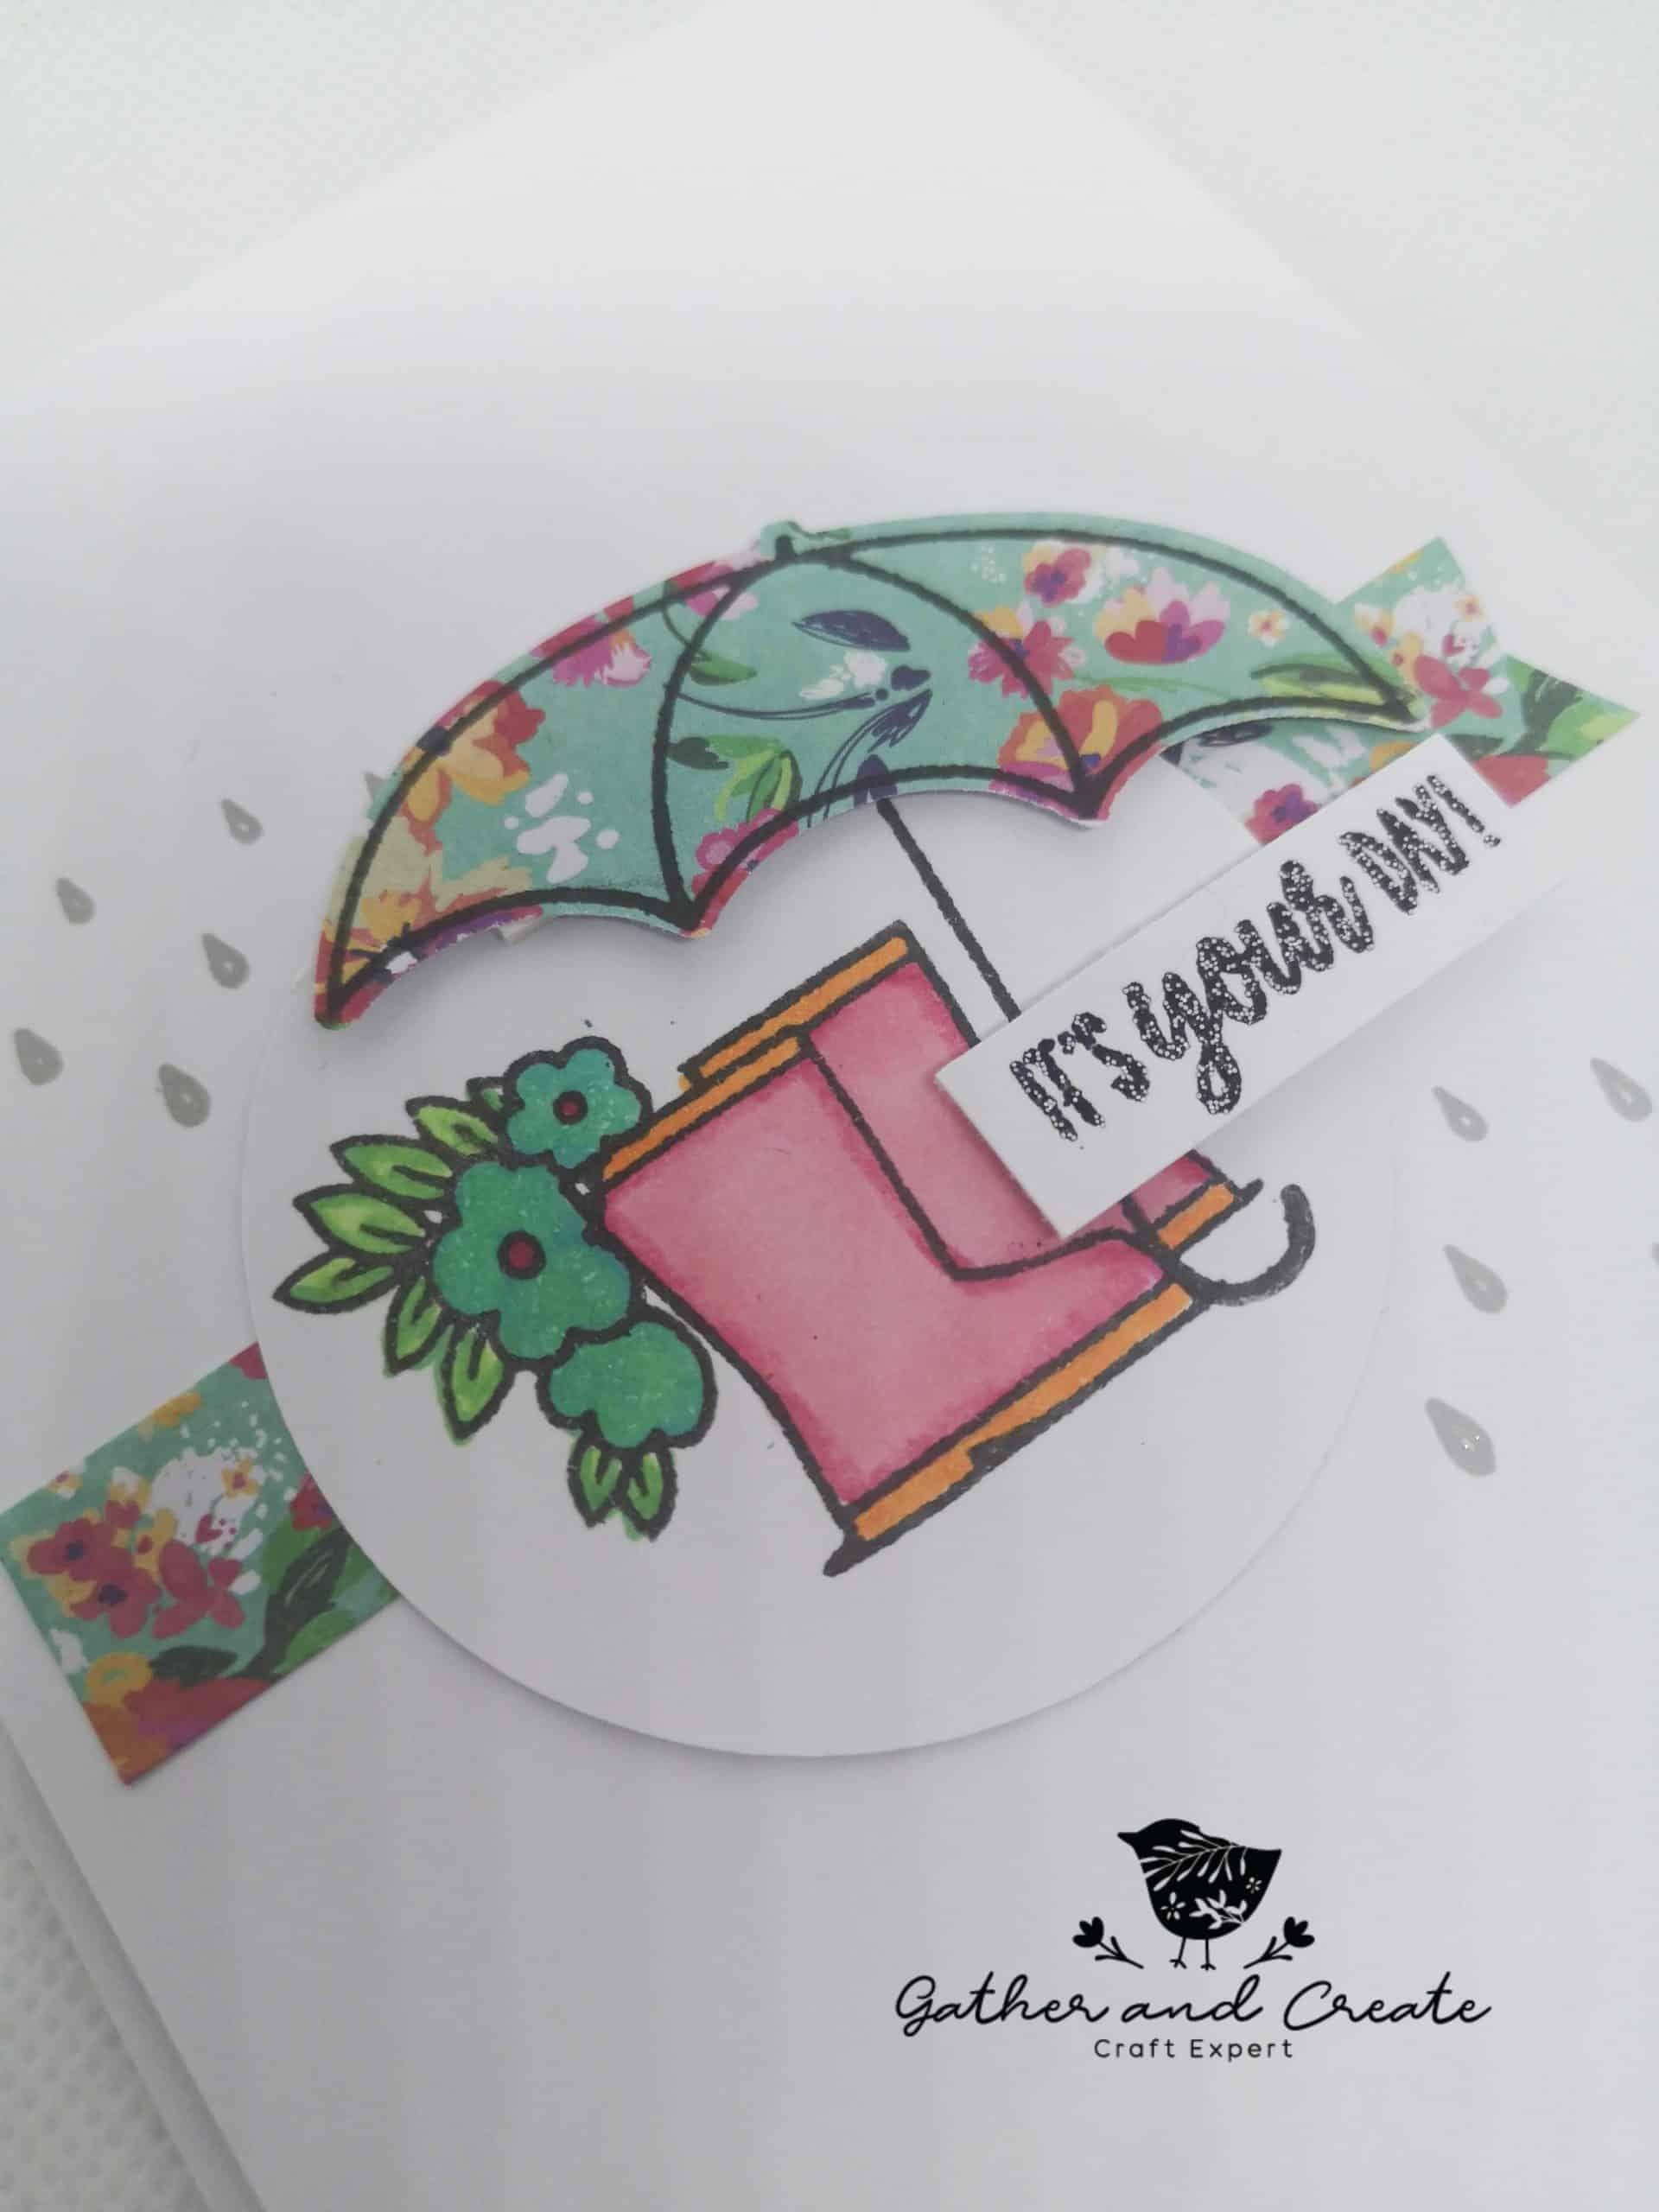 Stampin' Up! Under my umbrella cards